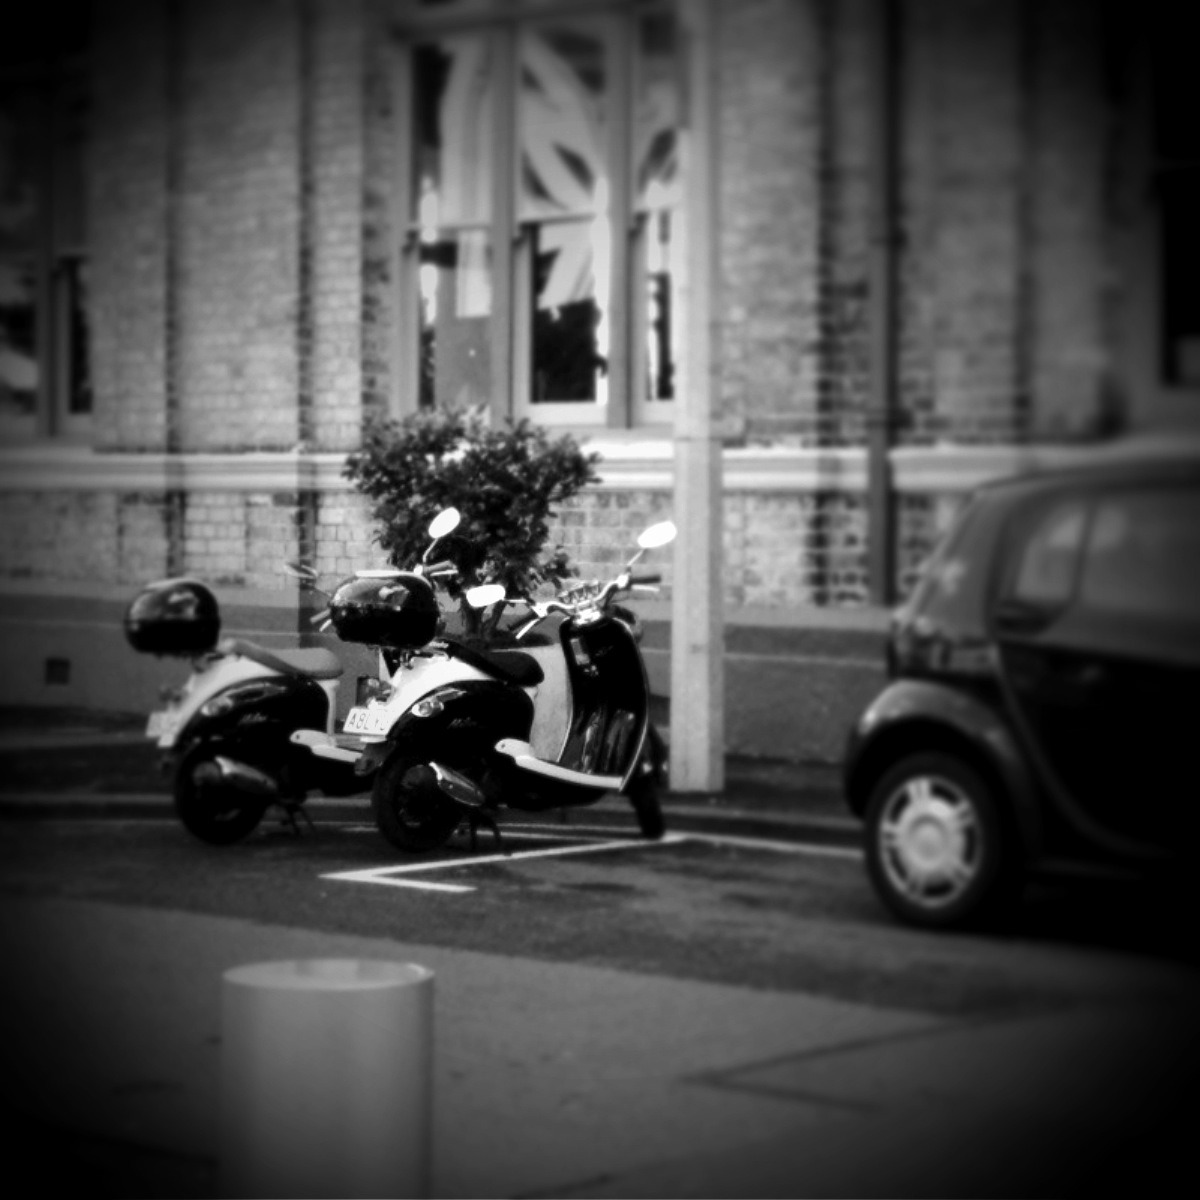 Romantic scooters